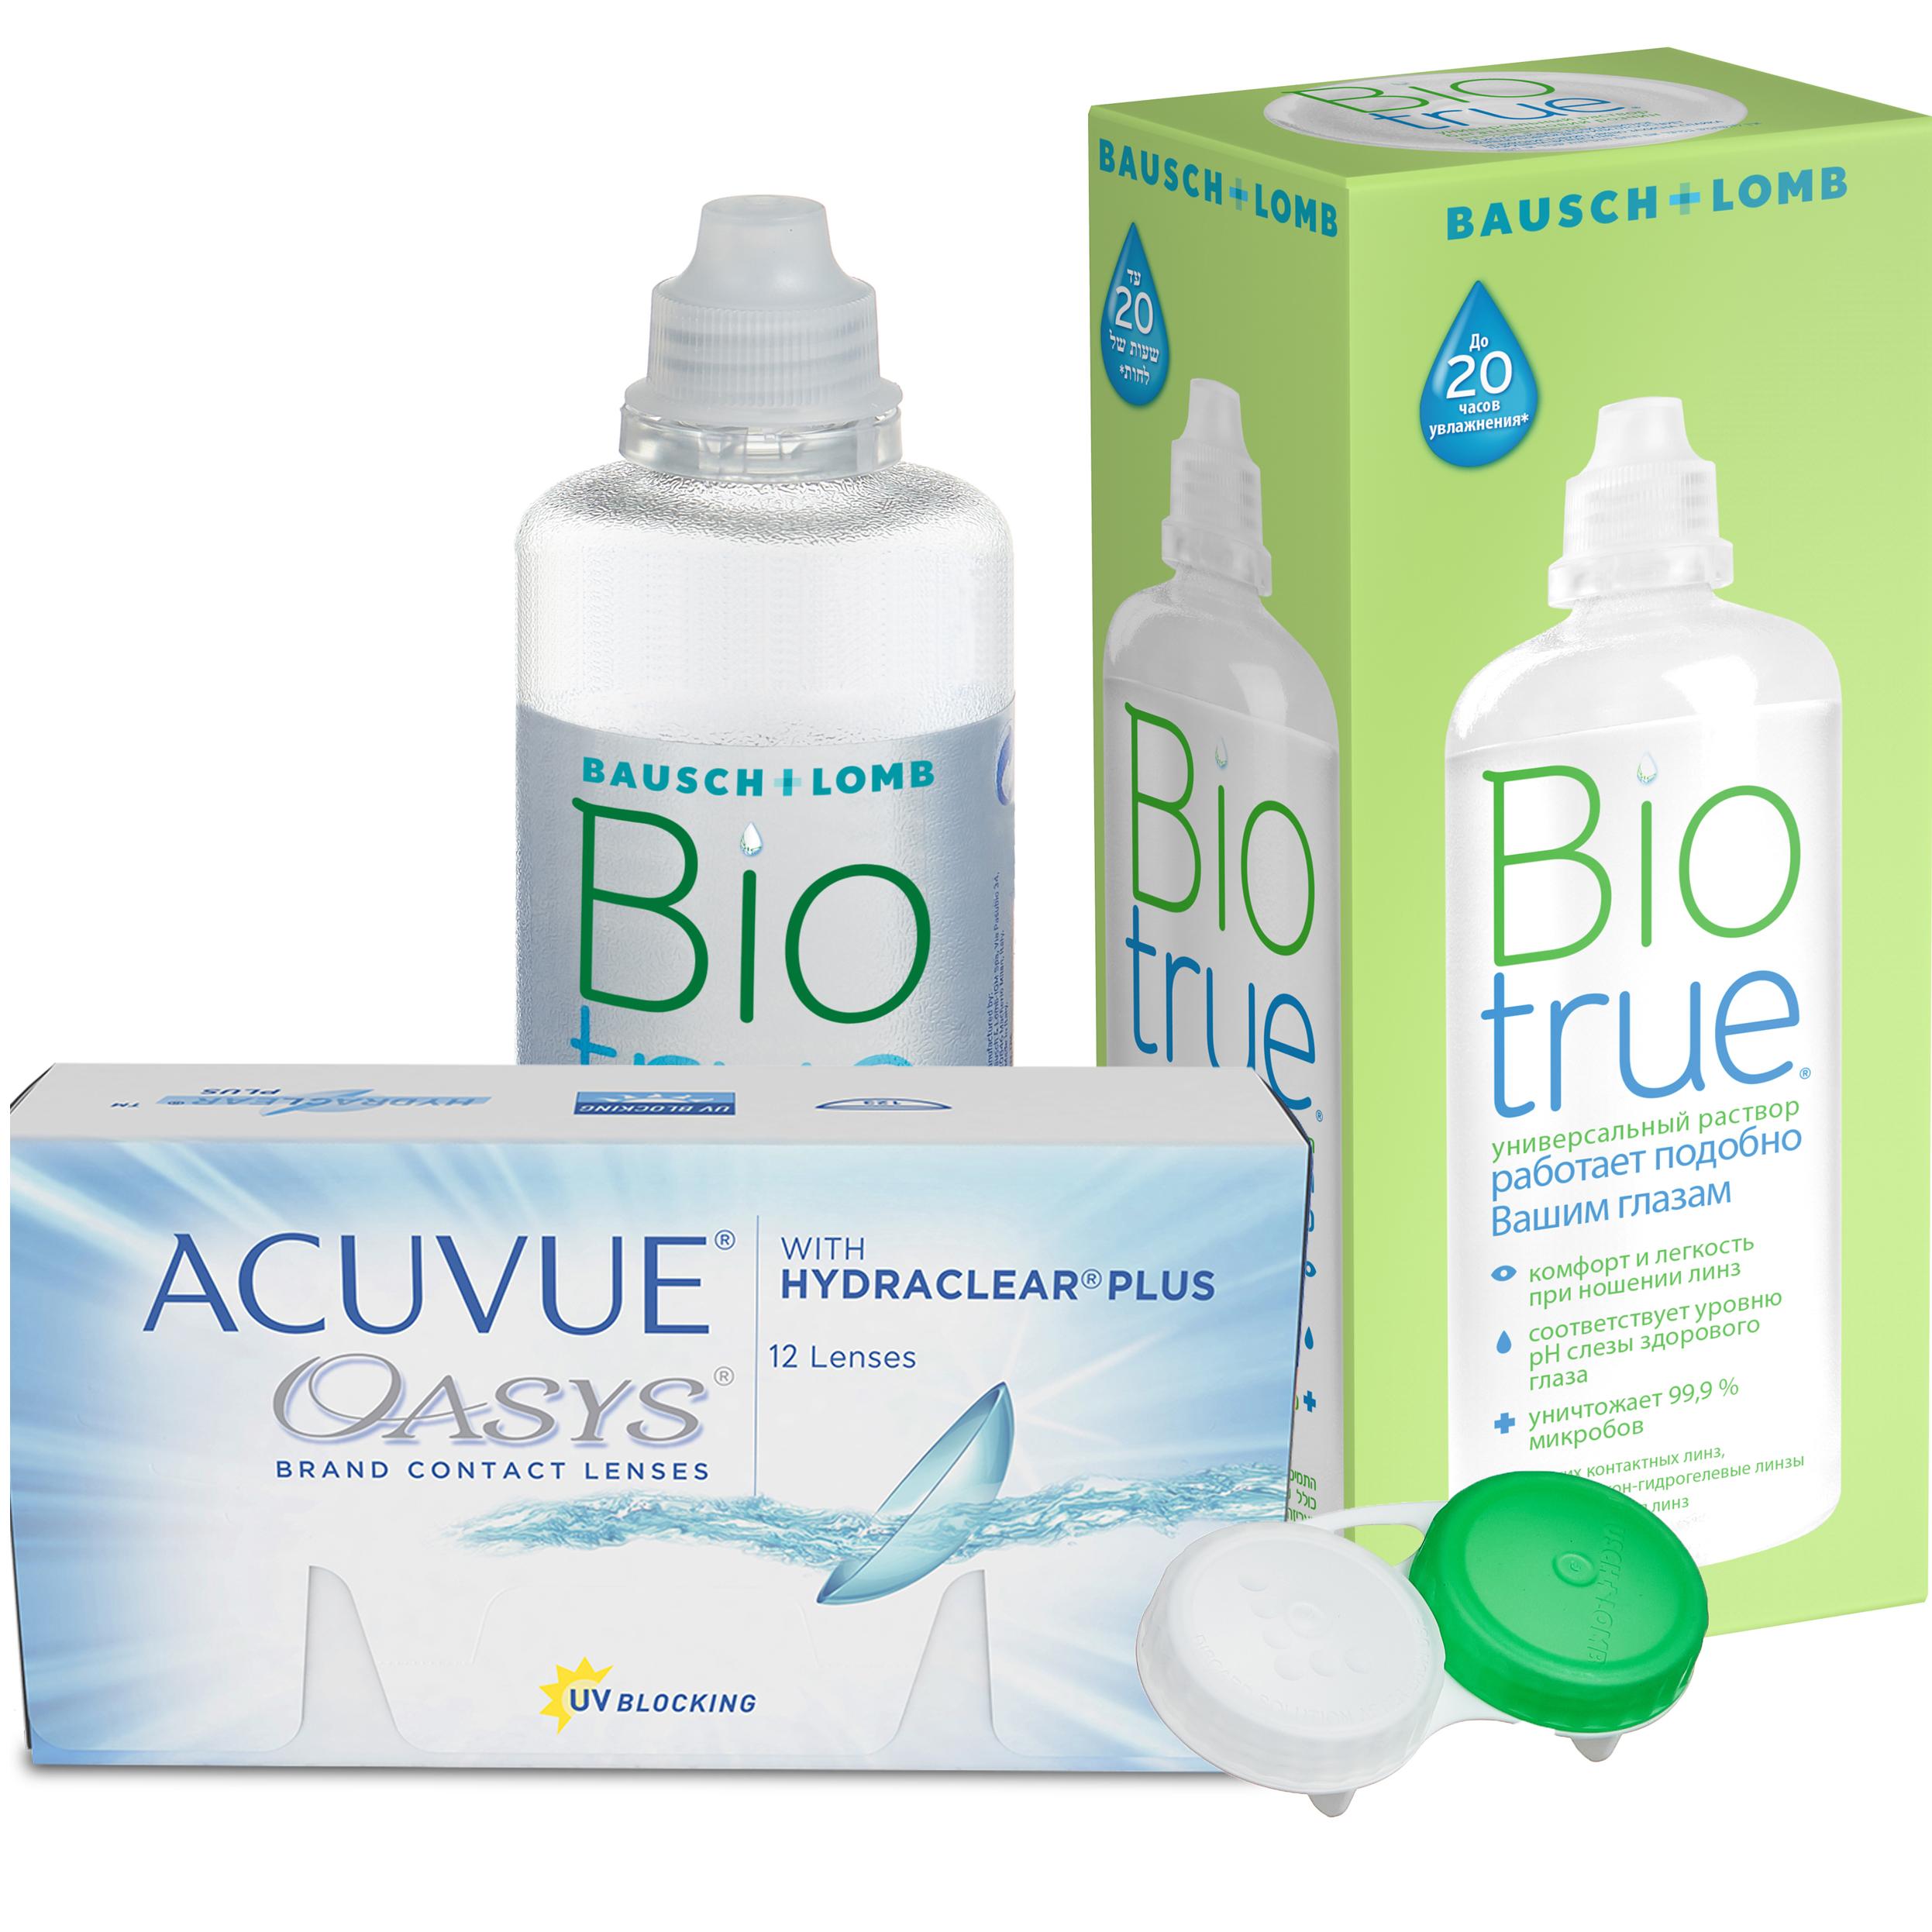 Oasys with Hydraclear Plus 12 линз + Biotrue, Контактные линзы Acuvue Oasys with Hydraclear Plus 12 линз R 8.8 +8, 00 + Biotrue 300 мл  - купить со скидкой